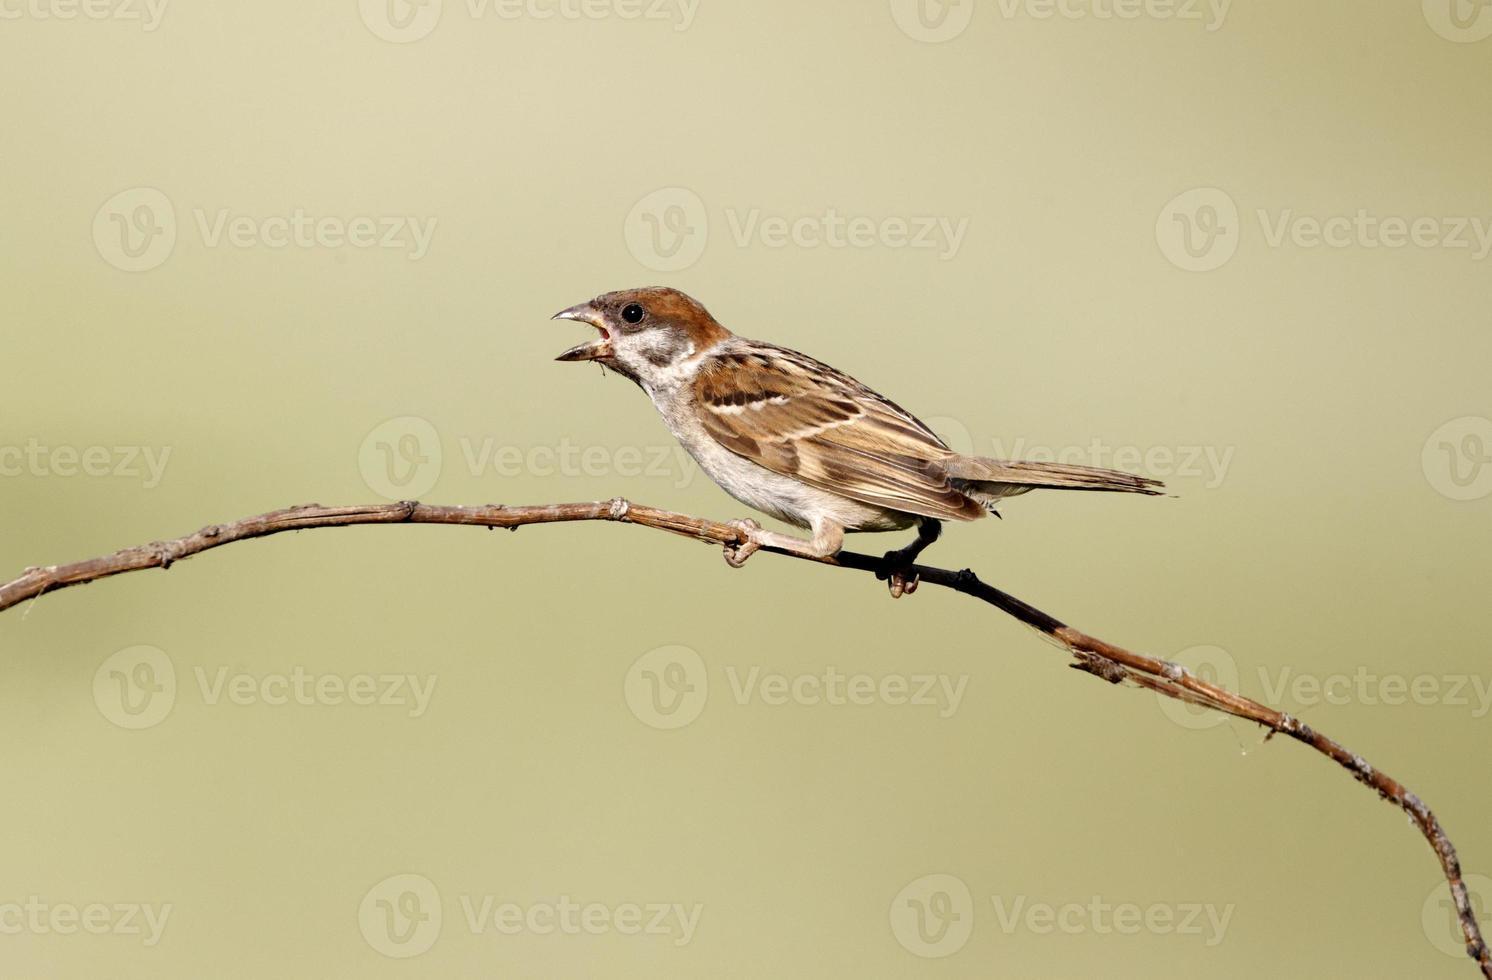 Tree sparrow, Passer montanus photo